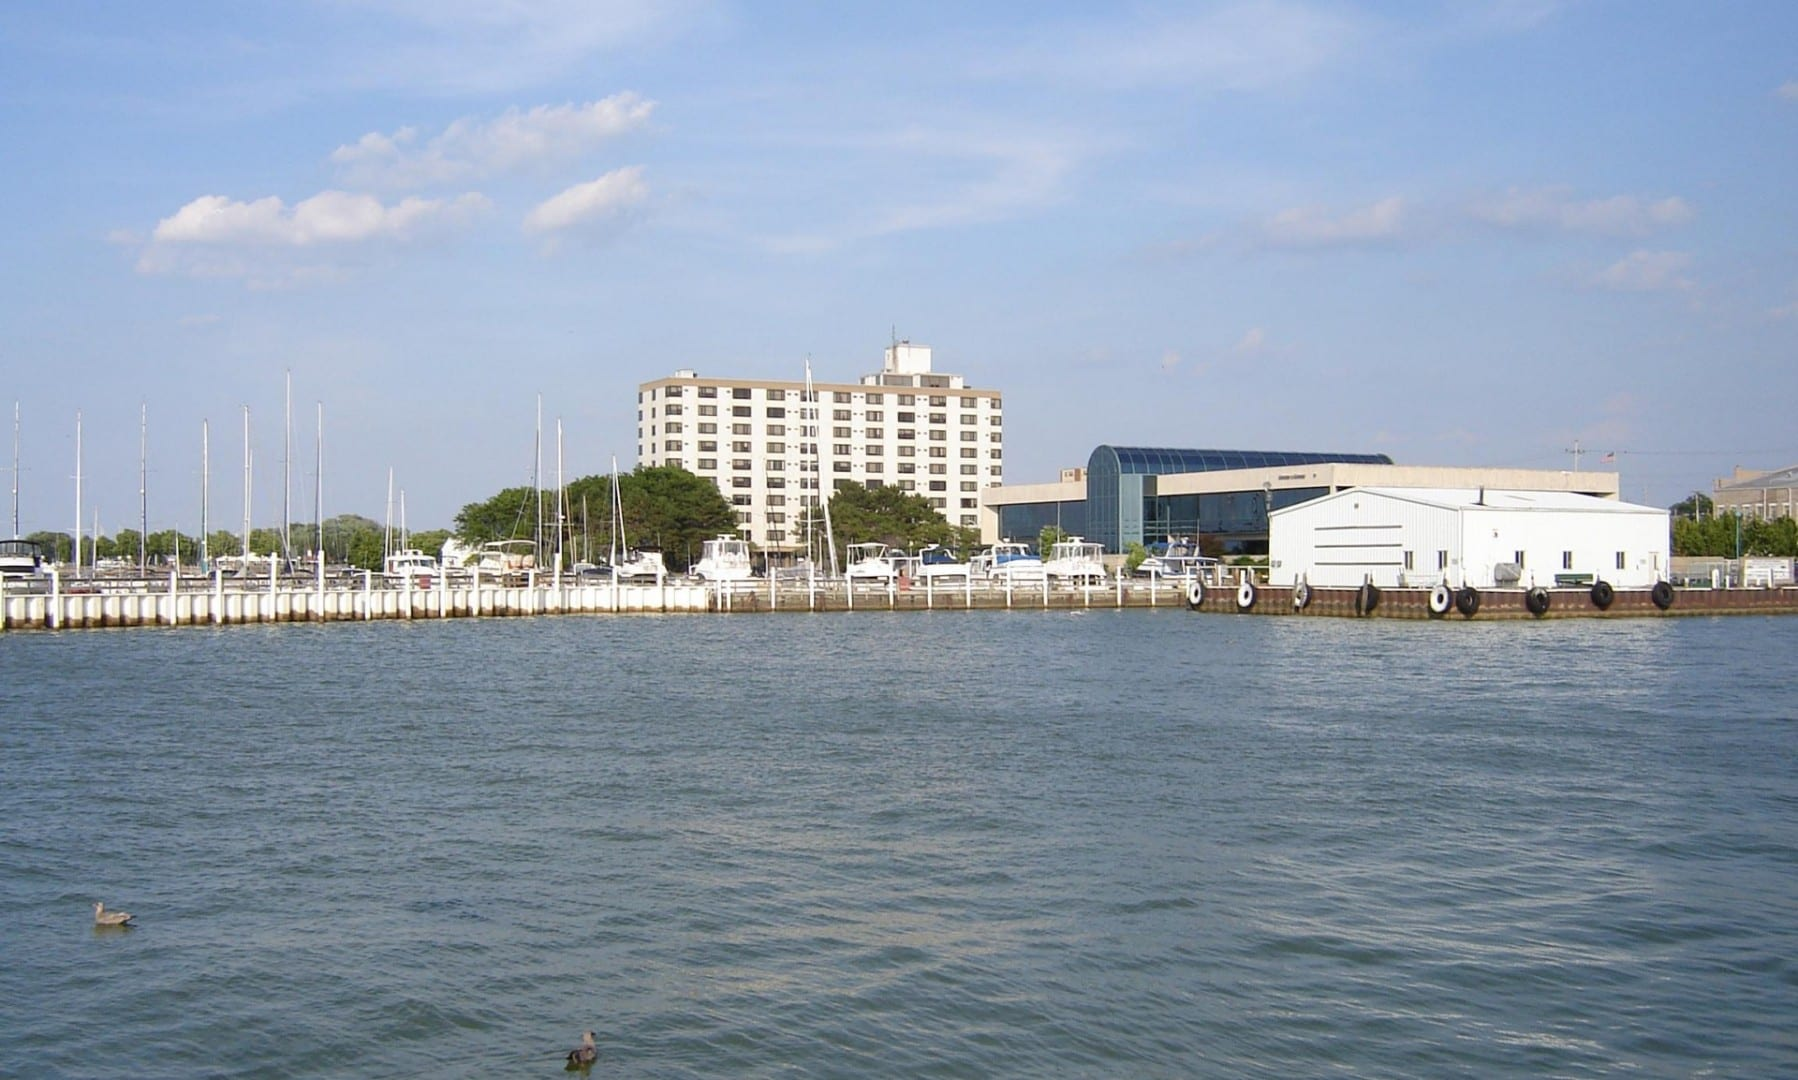 Waterfront Sandusky OH Estados Unidos